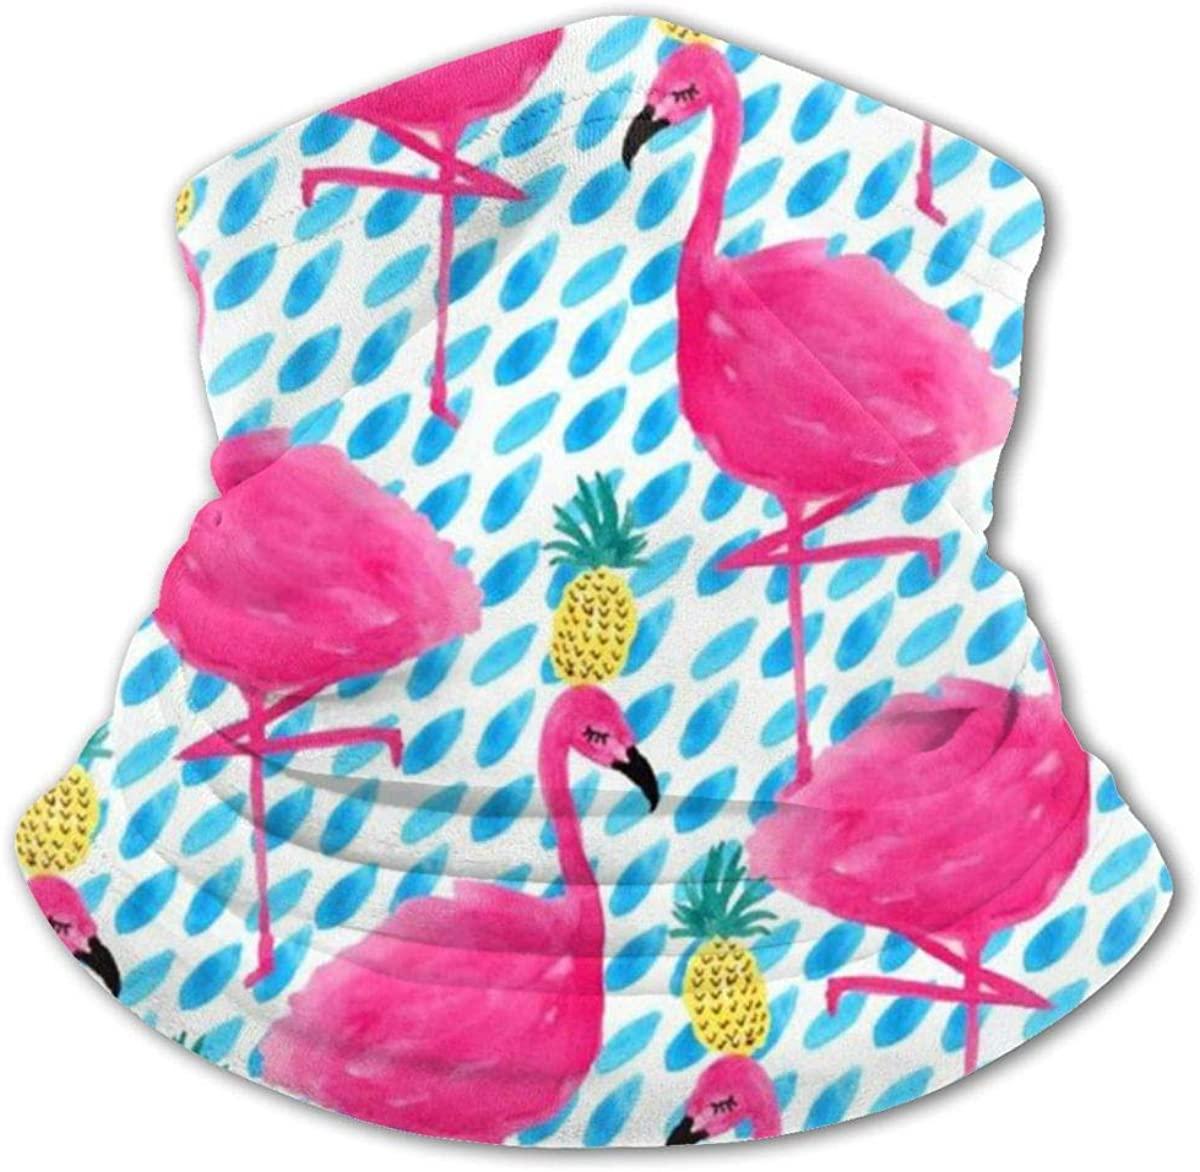 Flamingos And Pineapples Headwear For Girls And Boys, Head Wrap, Neck Gaiter, Headband, Tenn Fishing Mask, Magic Scarf, Tube Mask, Face Bandana Mask For Camping Running Cycling